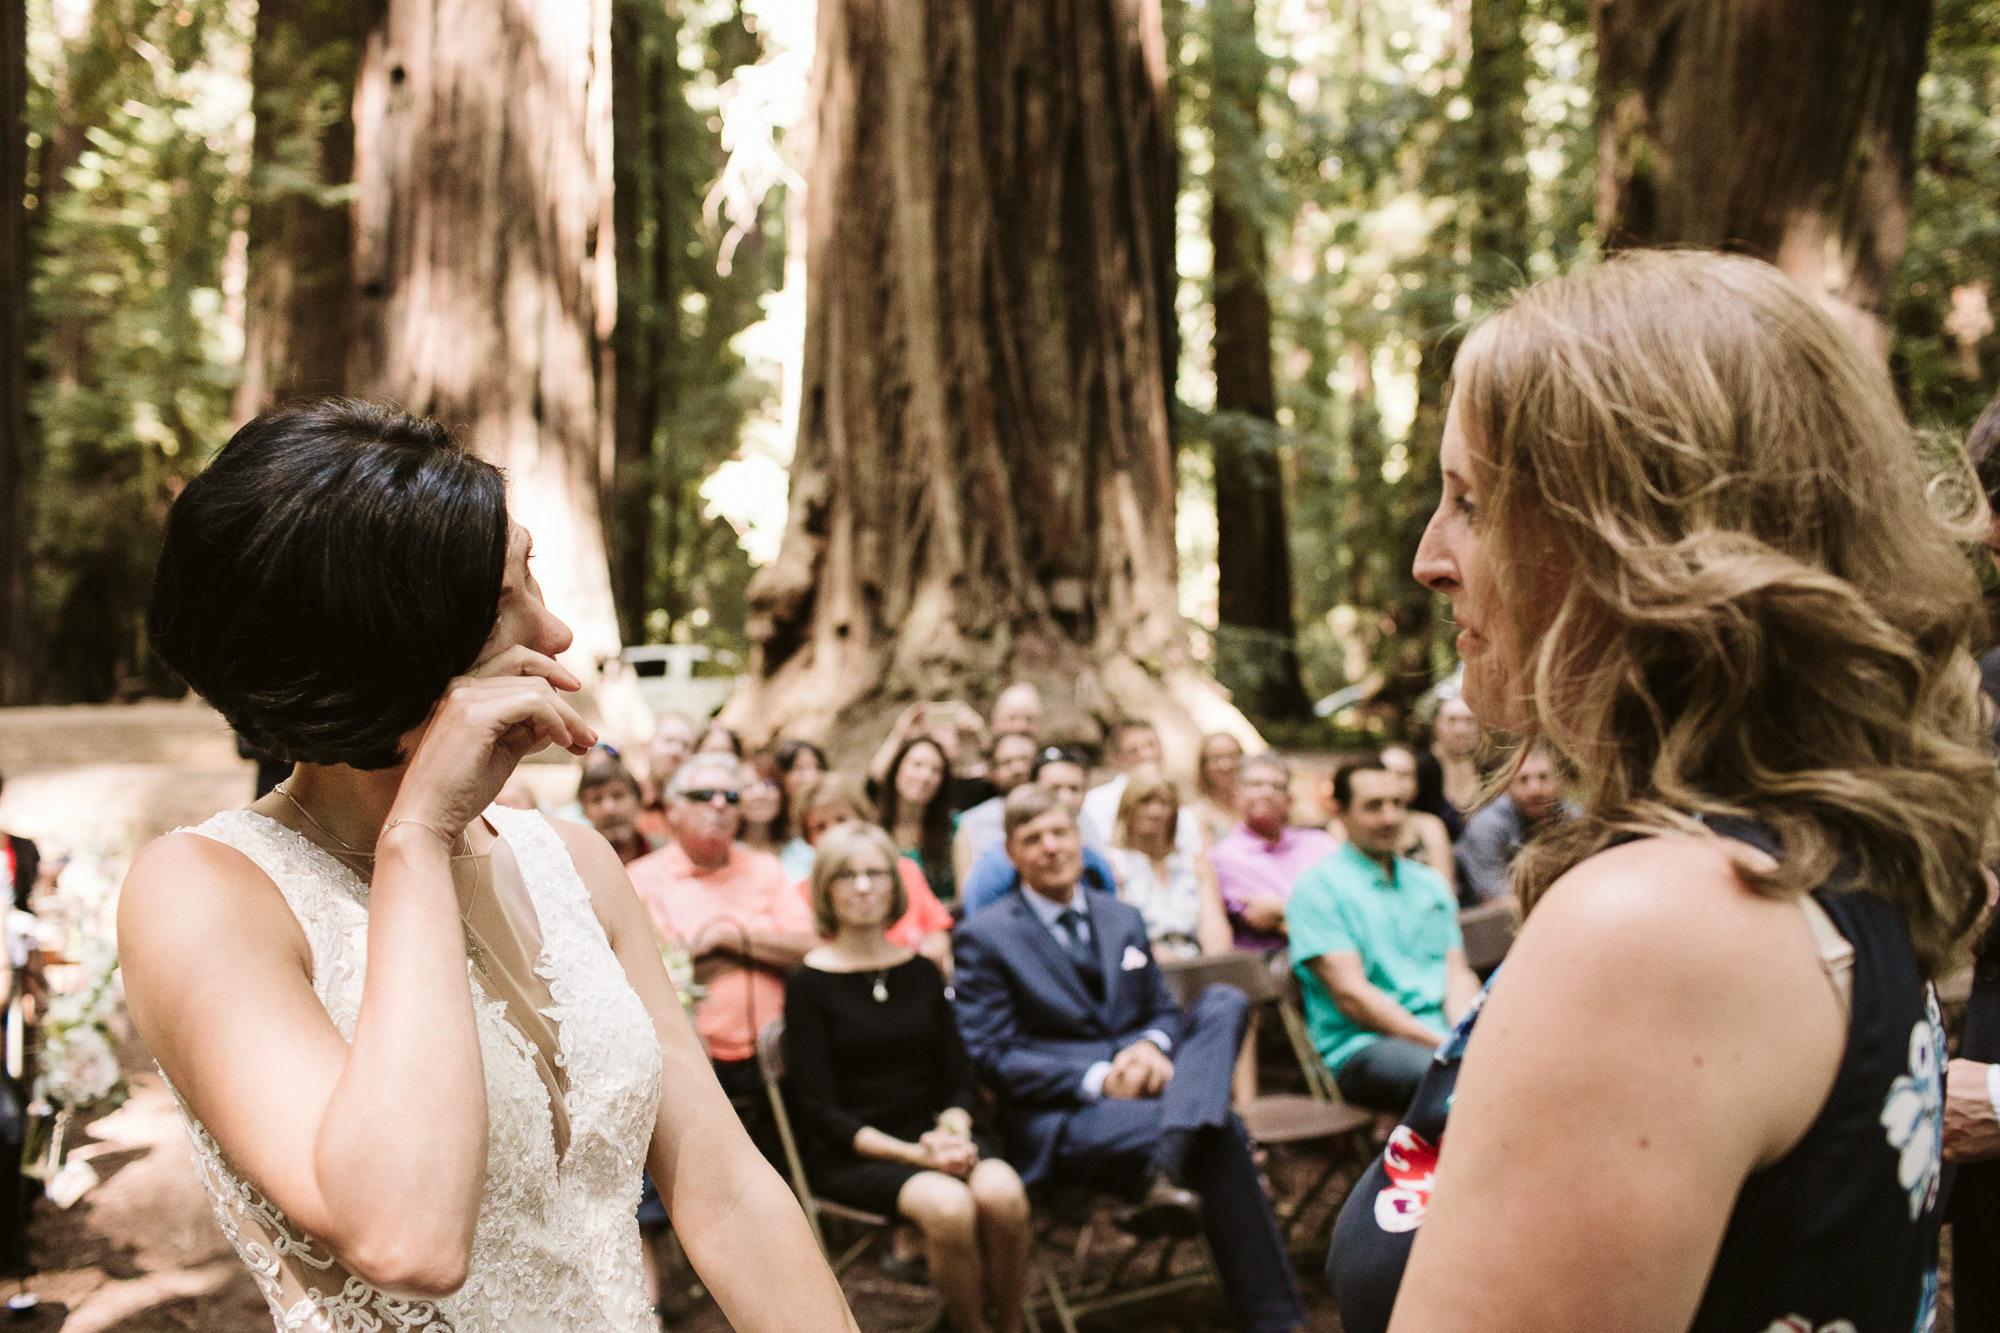 California-wedding-photographer-alfonso-flores-pamplin-groove-198.jpg